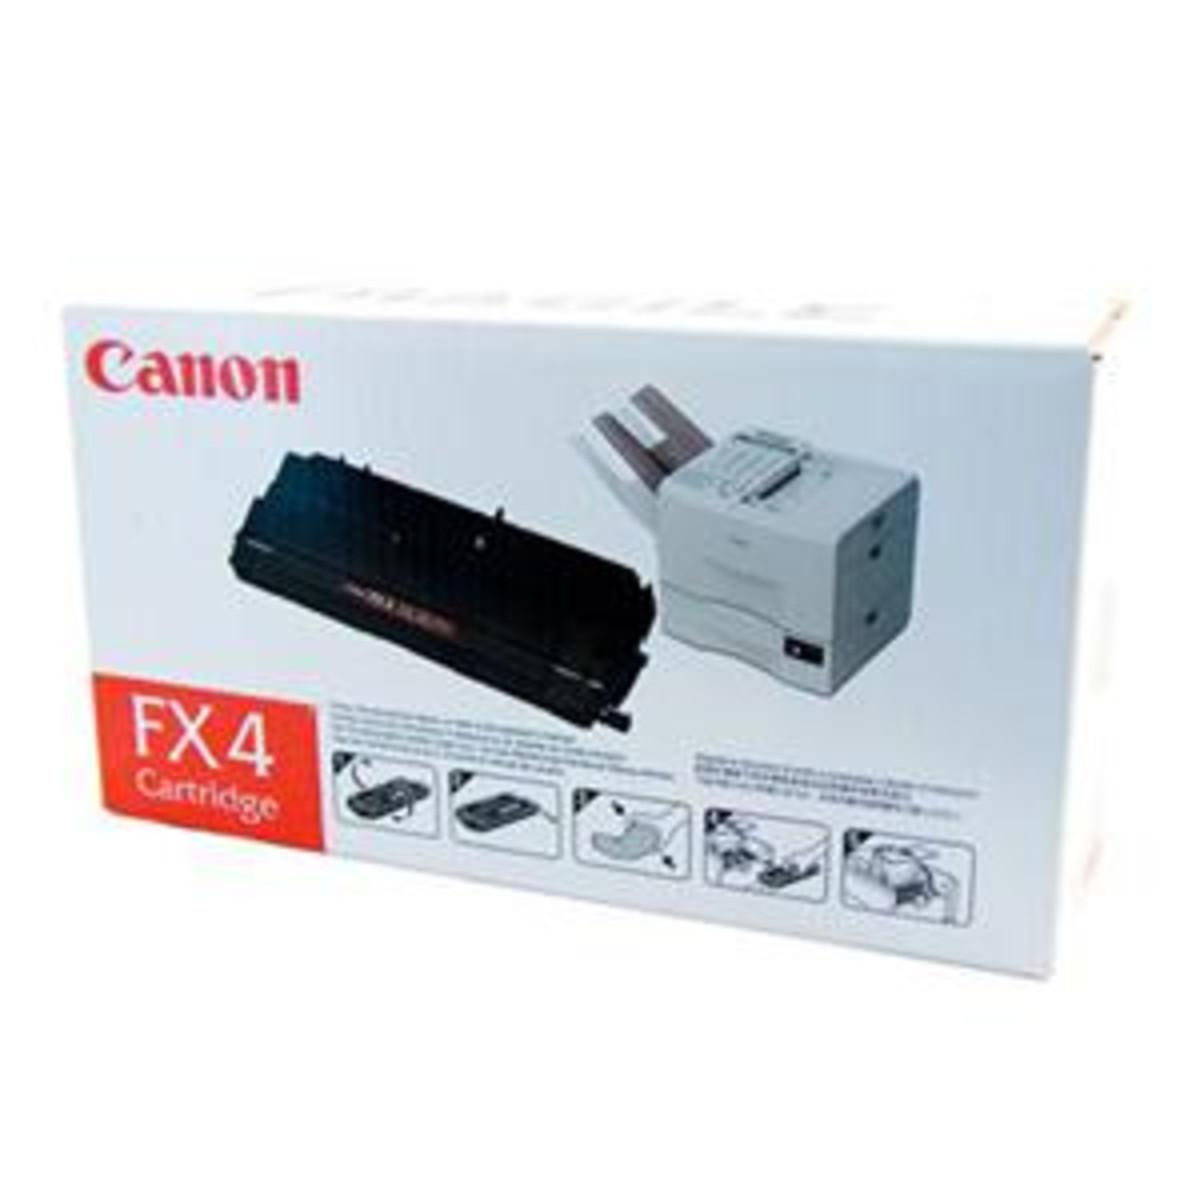 Canon FX-4 Black Toner Cartridge